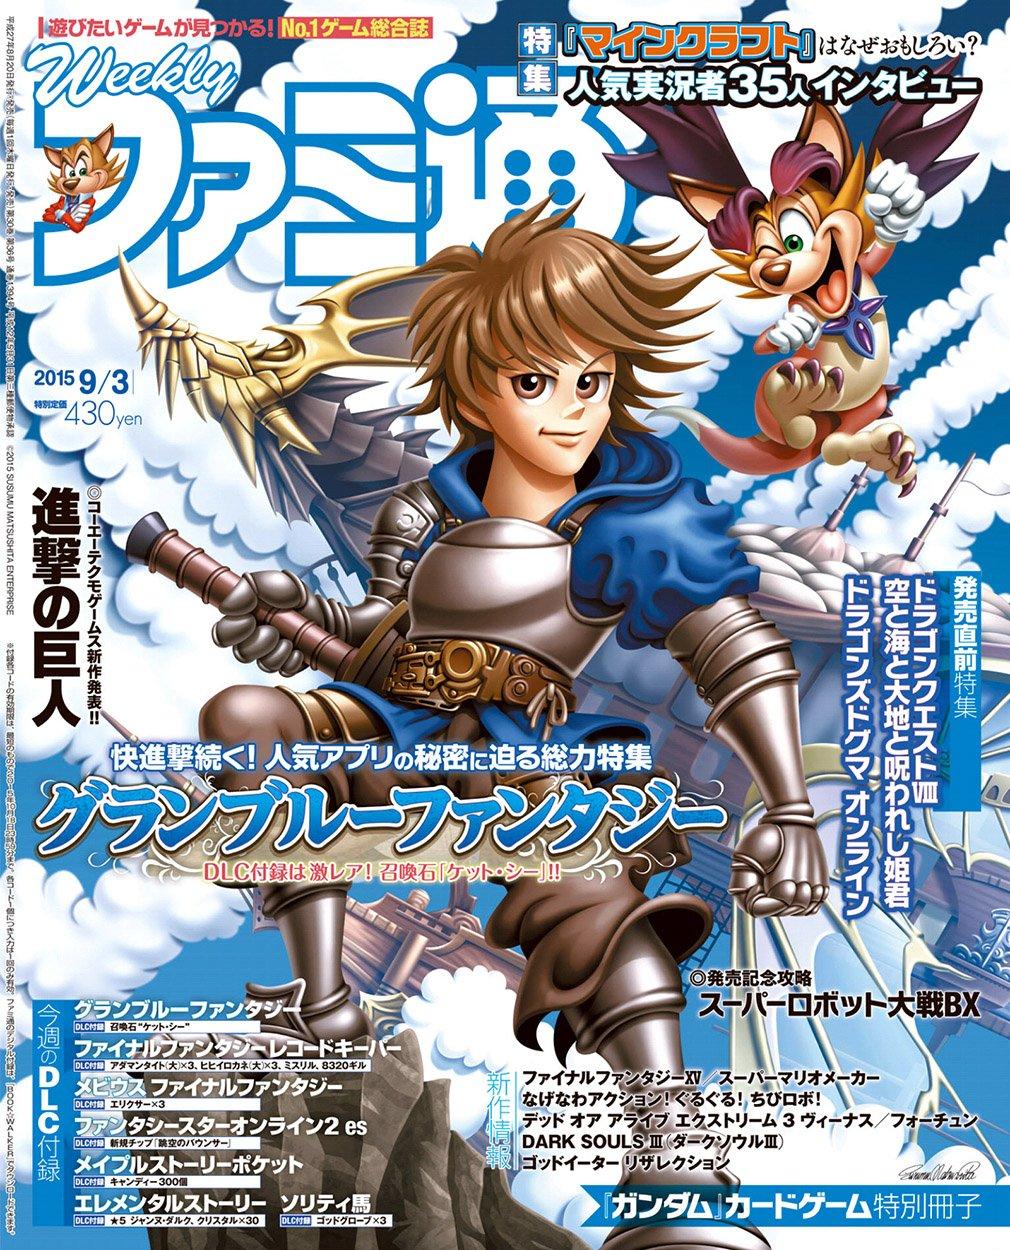 Famitsu 1394 September 3 2015